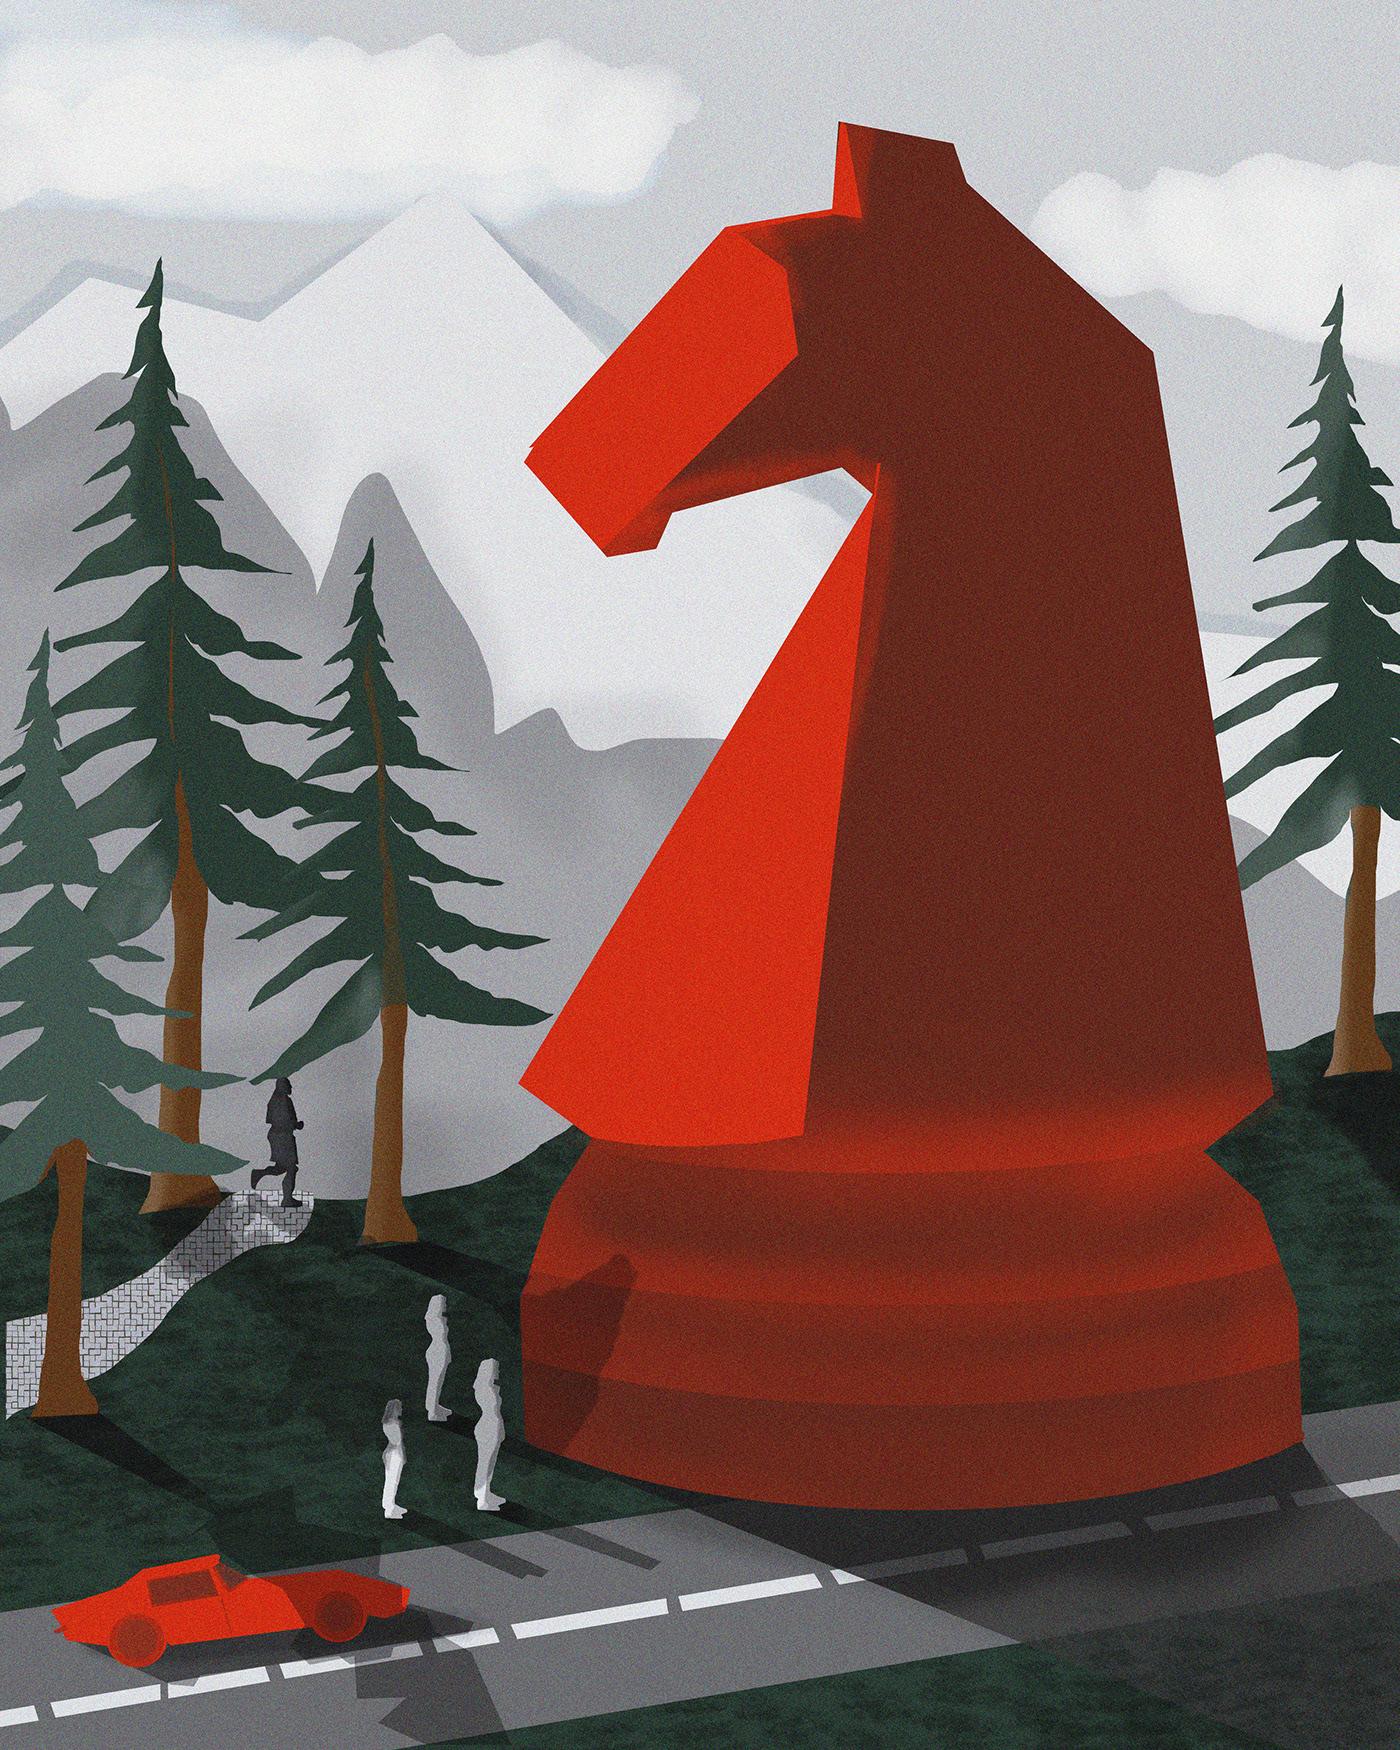 art chess digitalart Drawing  editorial ILLUSTRATION  Landscape painting   photoshop print